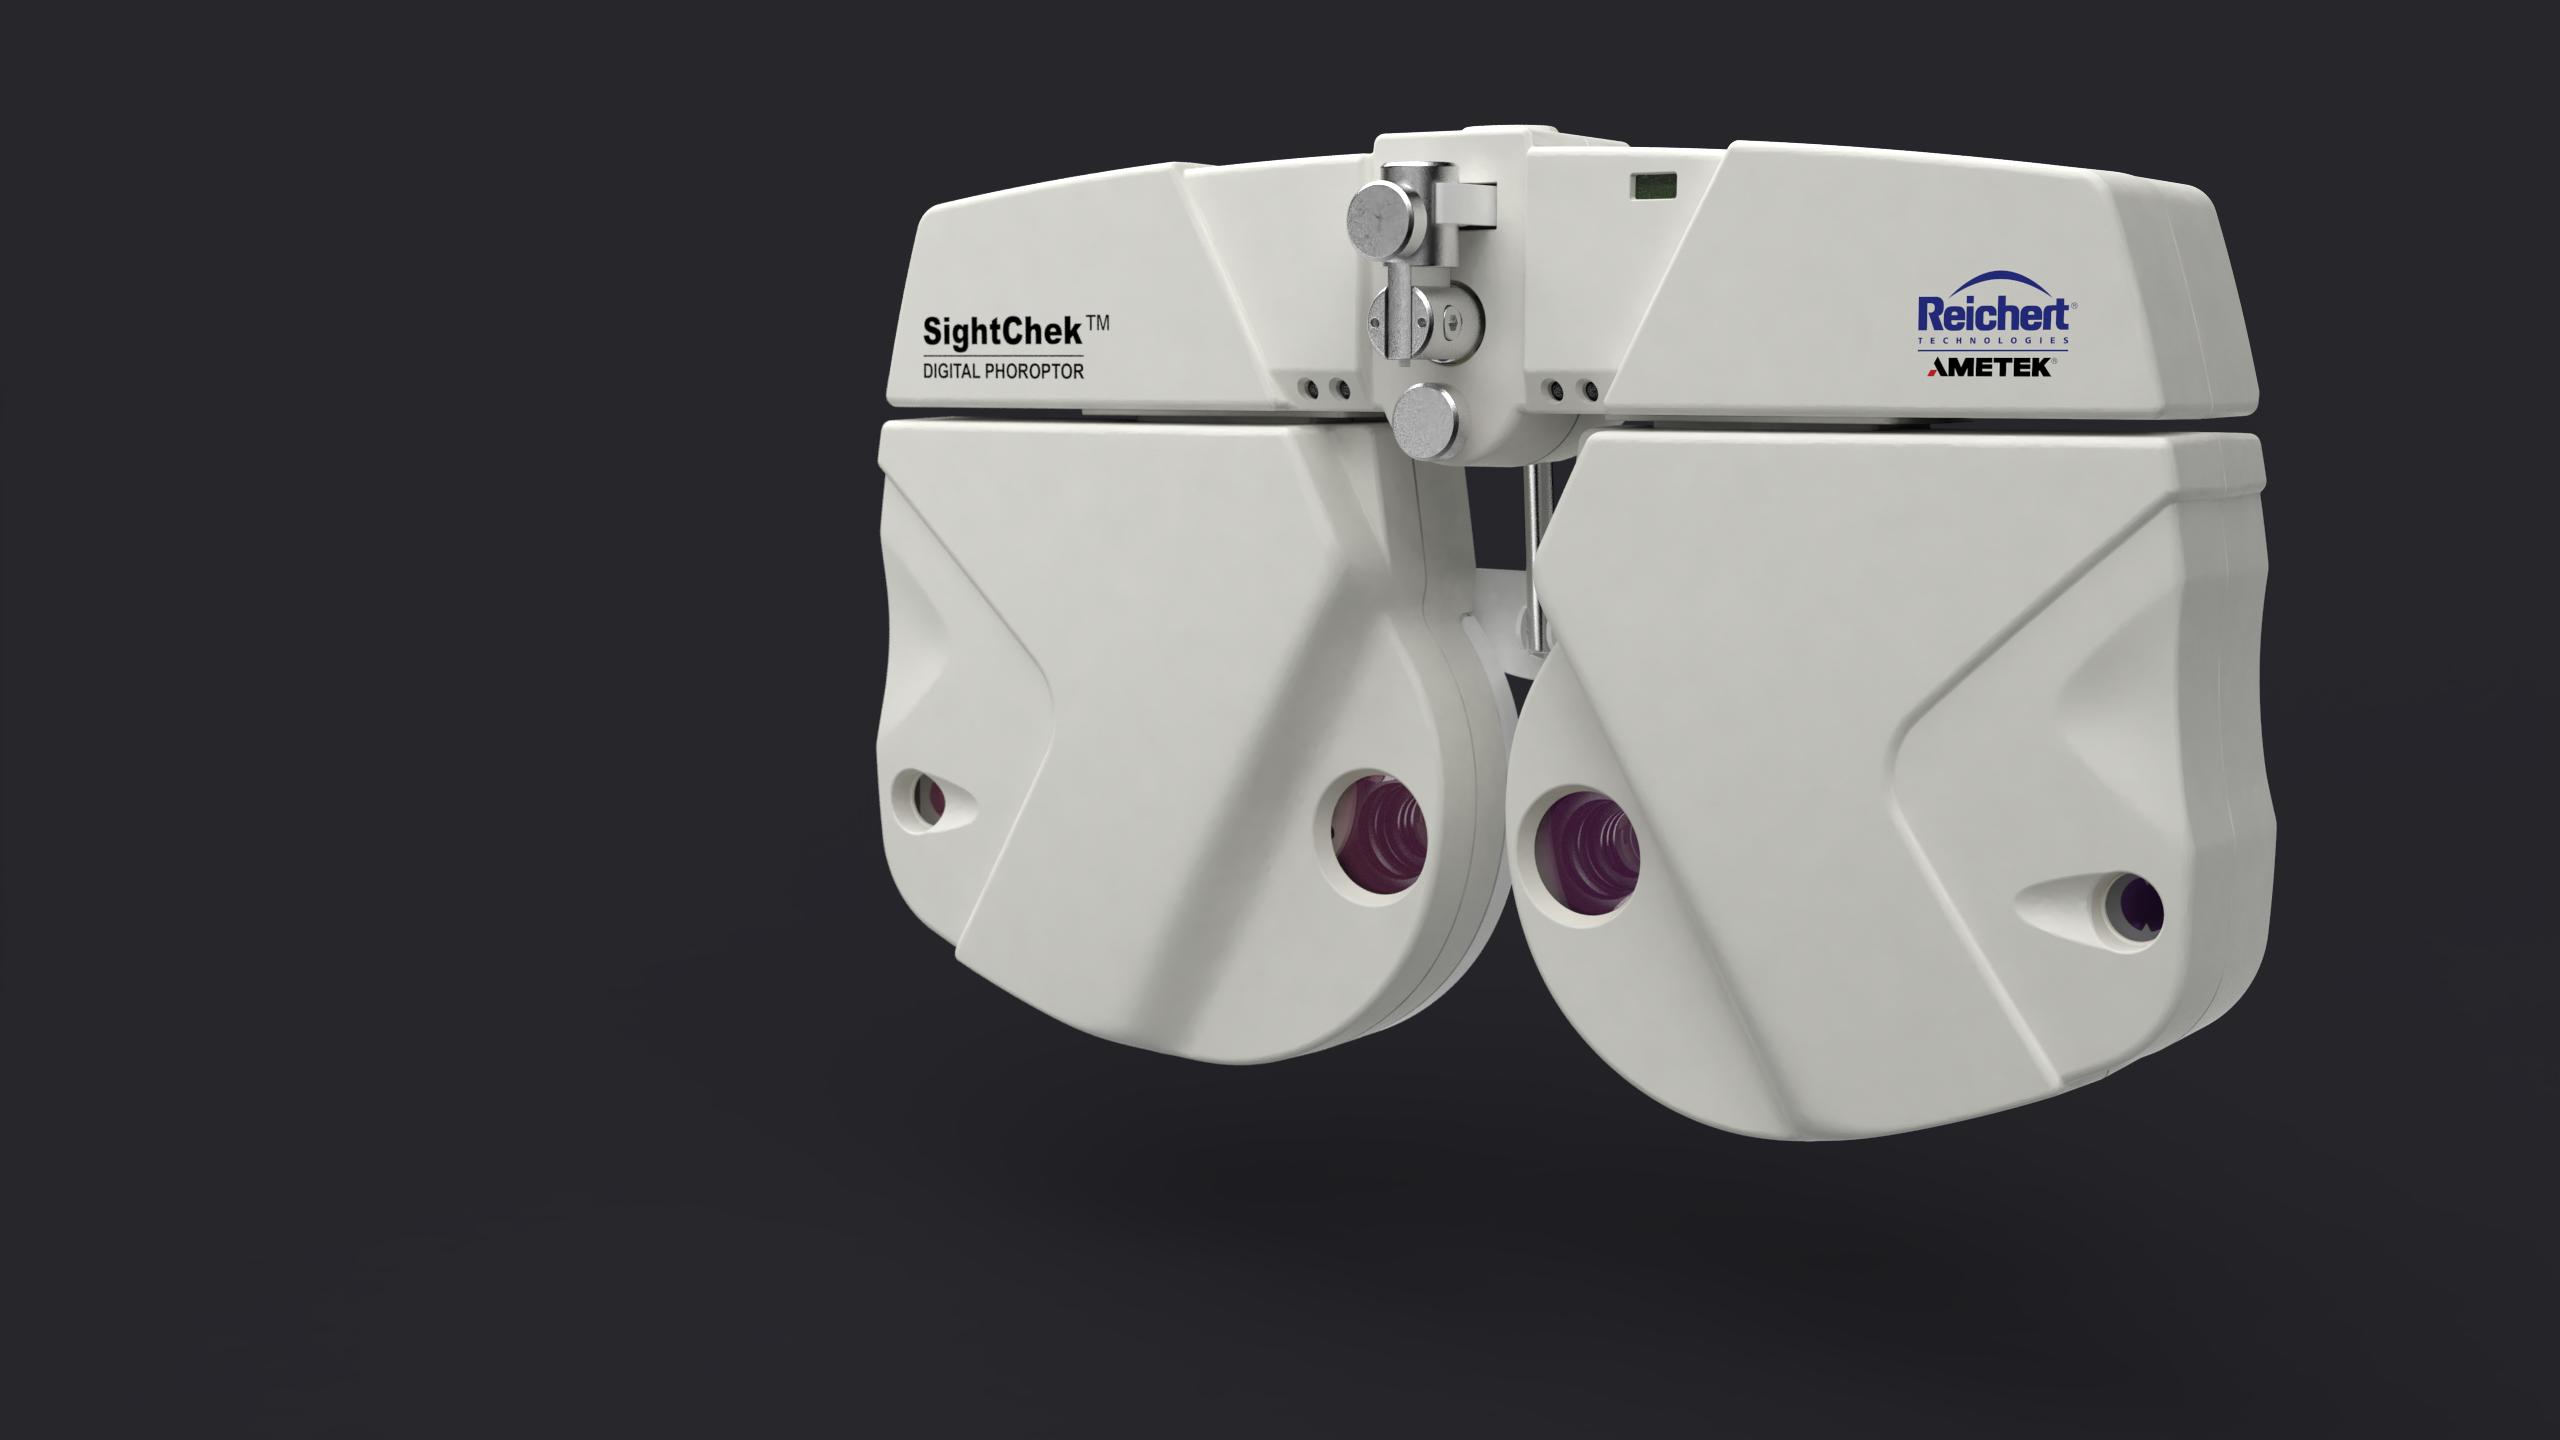 Design du SightChek Digital Phoroptor